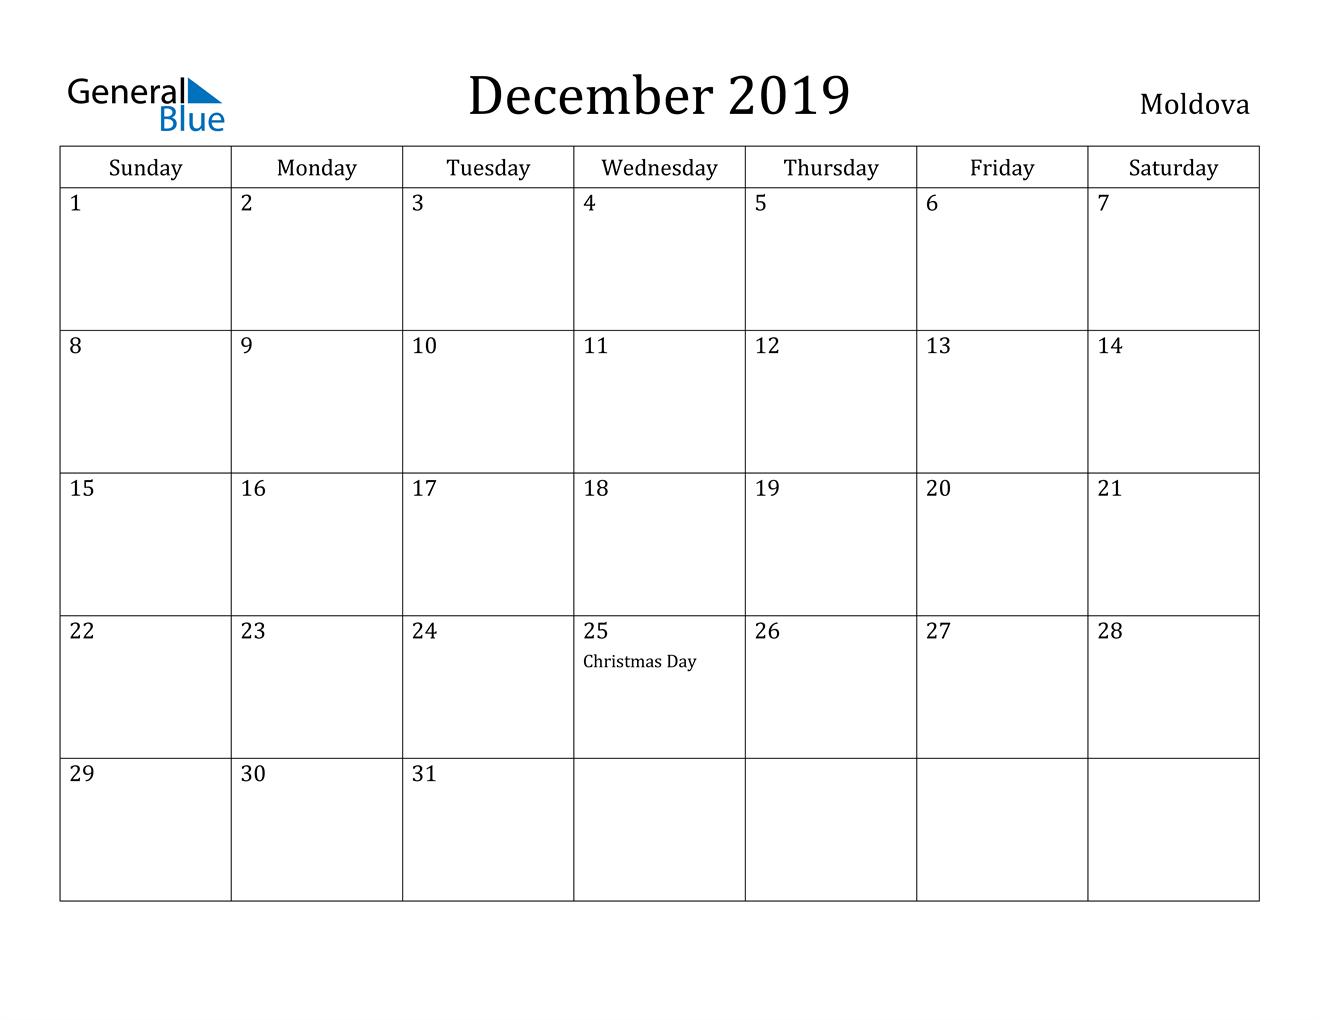 Image of December 2019 Moldova Calendar with Holidays Calendar